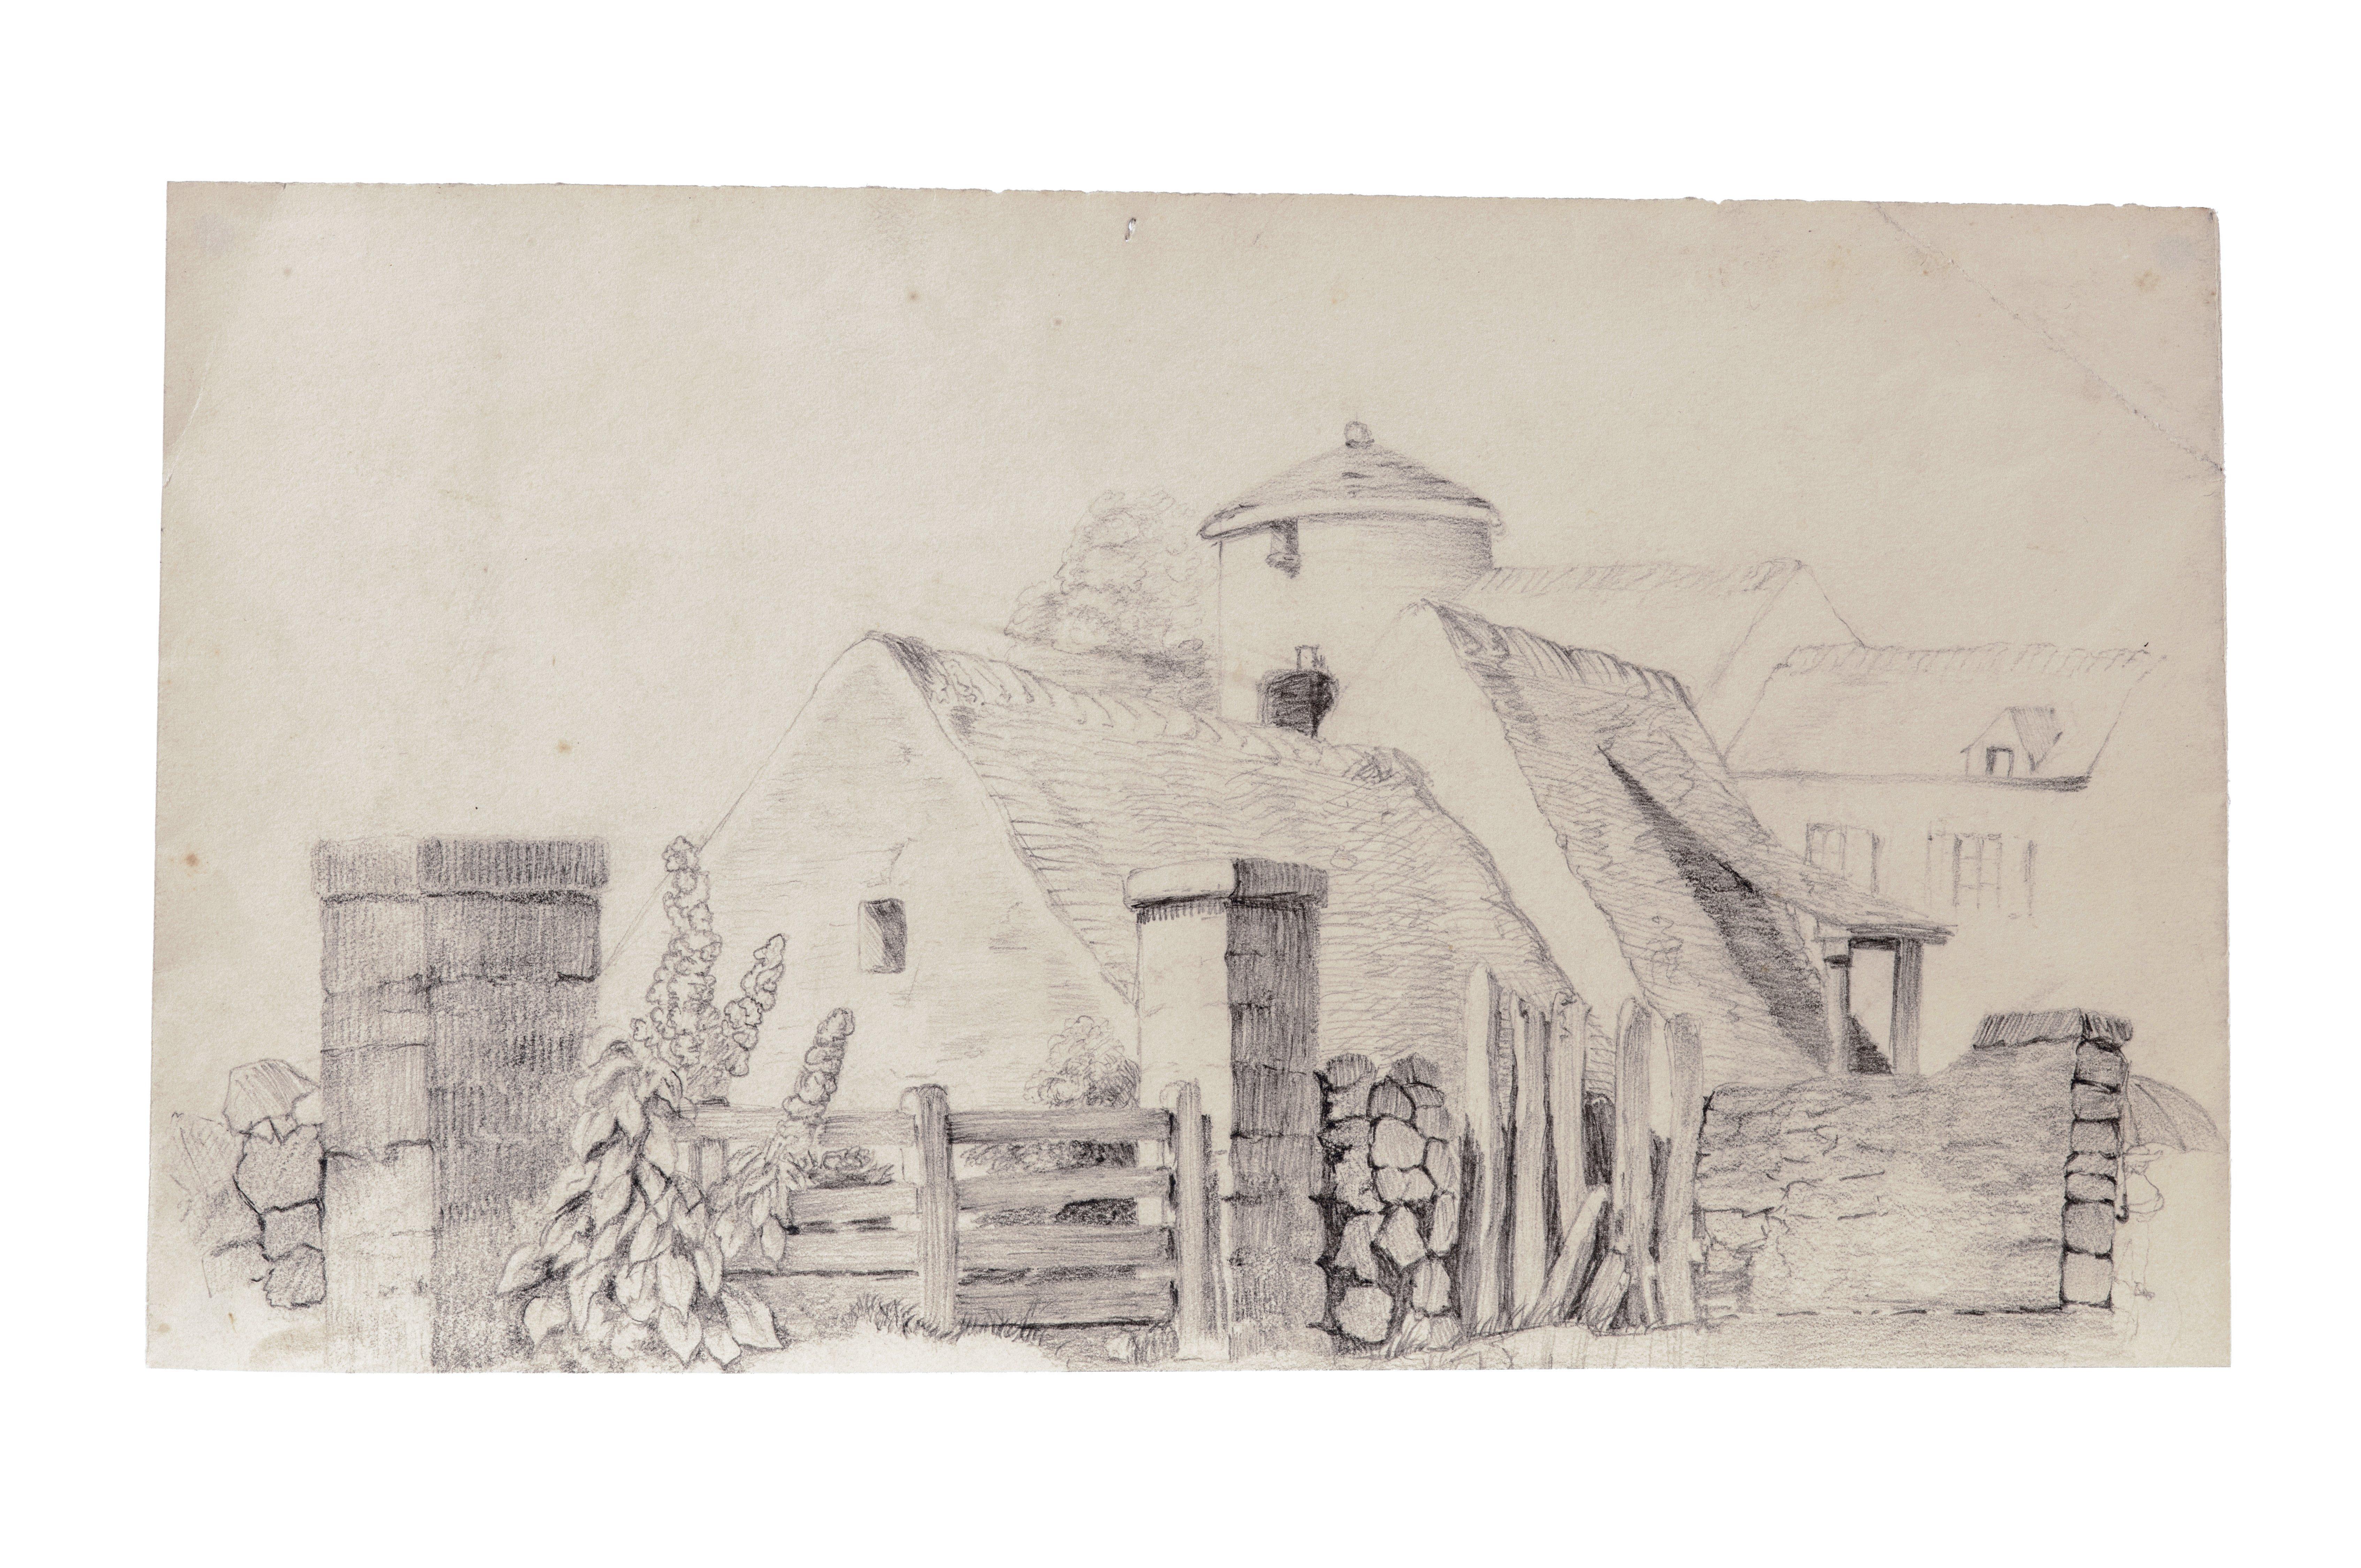 A 19th Century English Primitive Farm Scene Drawing